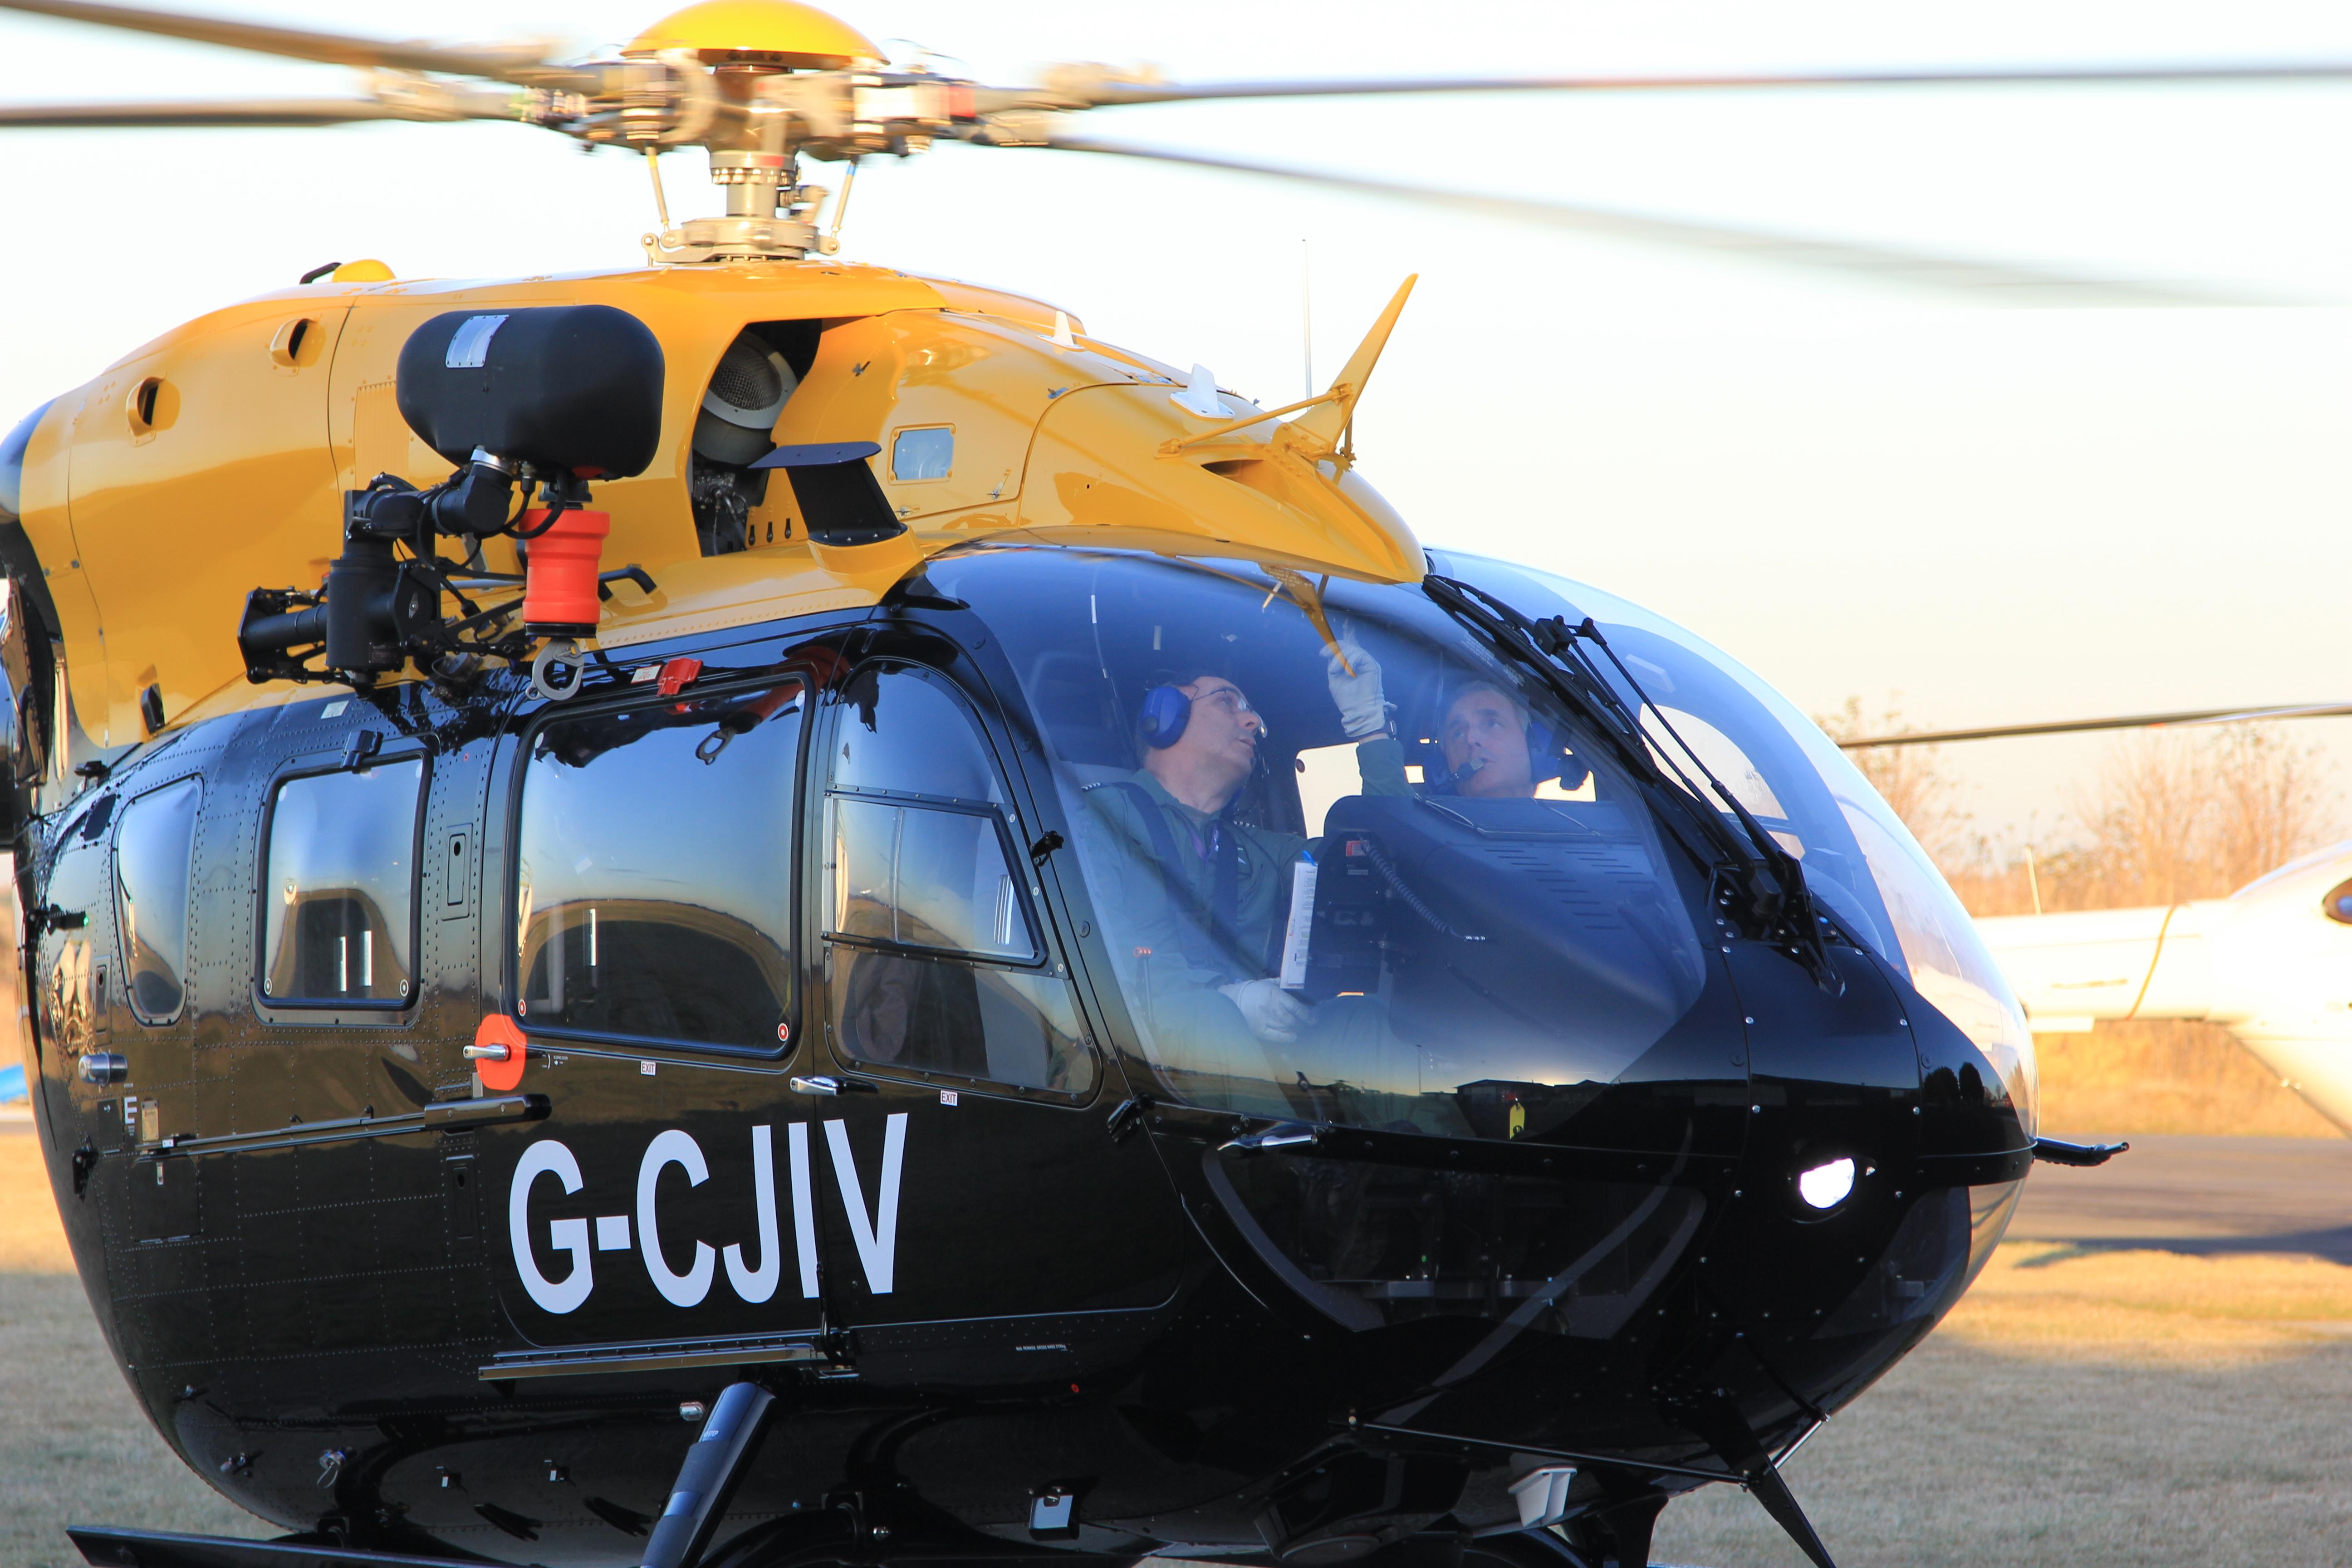 UK Corner - Airbus Helicopters on submarine pilot, blackhawk pilot, girl plane pilot, uh-60 pilot, uh-72a lakota pilot, mig-23 pilot, uh-1 pilot, pave low pilot, apache pilot, jetpack pilot, f-35 pilot, funny pilot, ah-1 pilot, aviator pilot, v-22 osprey pilot, airplane pilot, bell 407 pilot, ch-53 pilot, chinook pilot, aircraft carrier pilot,